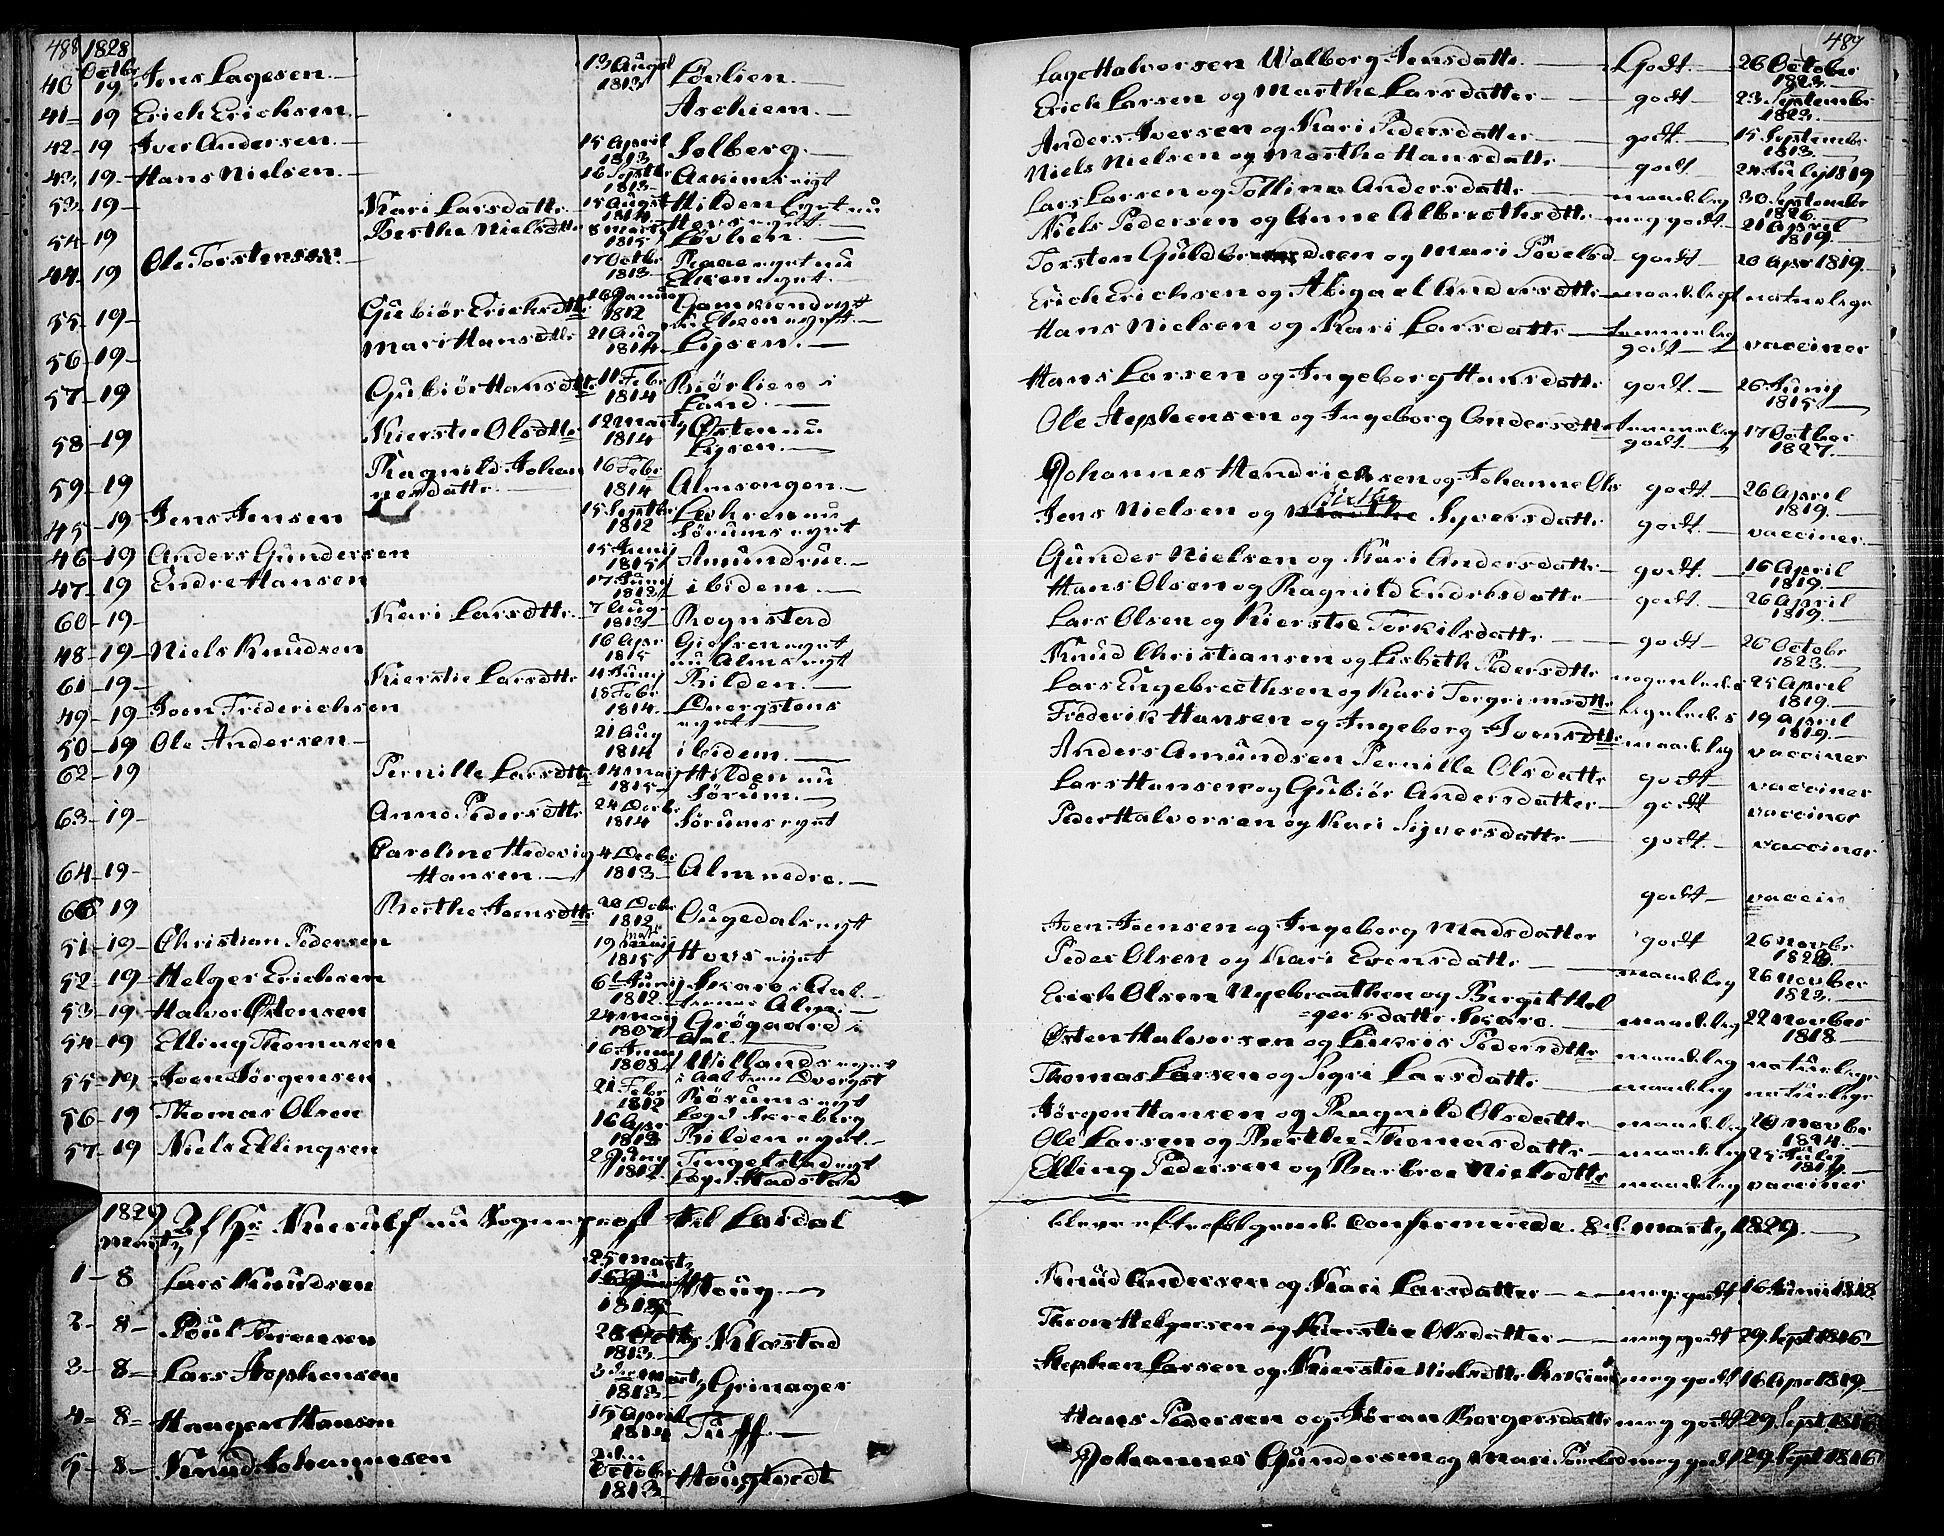 SAH, Gran prestekontor, Ministerialbok nr. 10, 1824-1842, s. 488-489